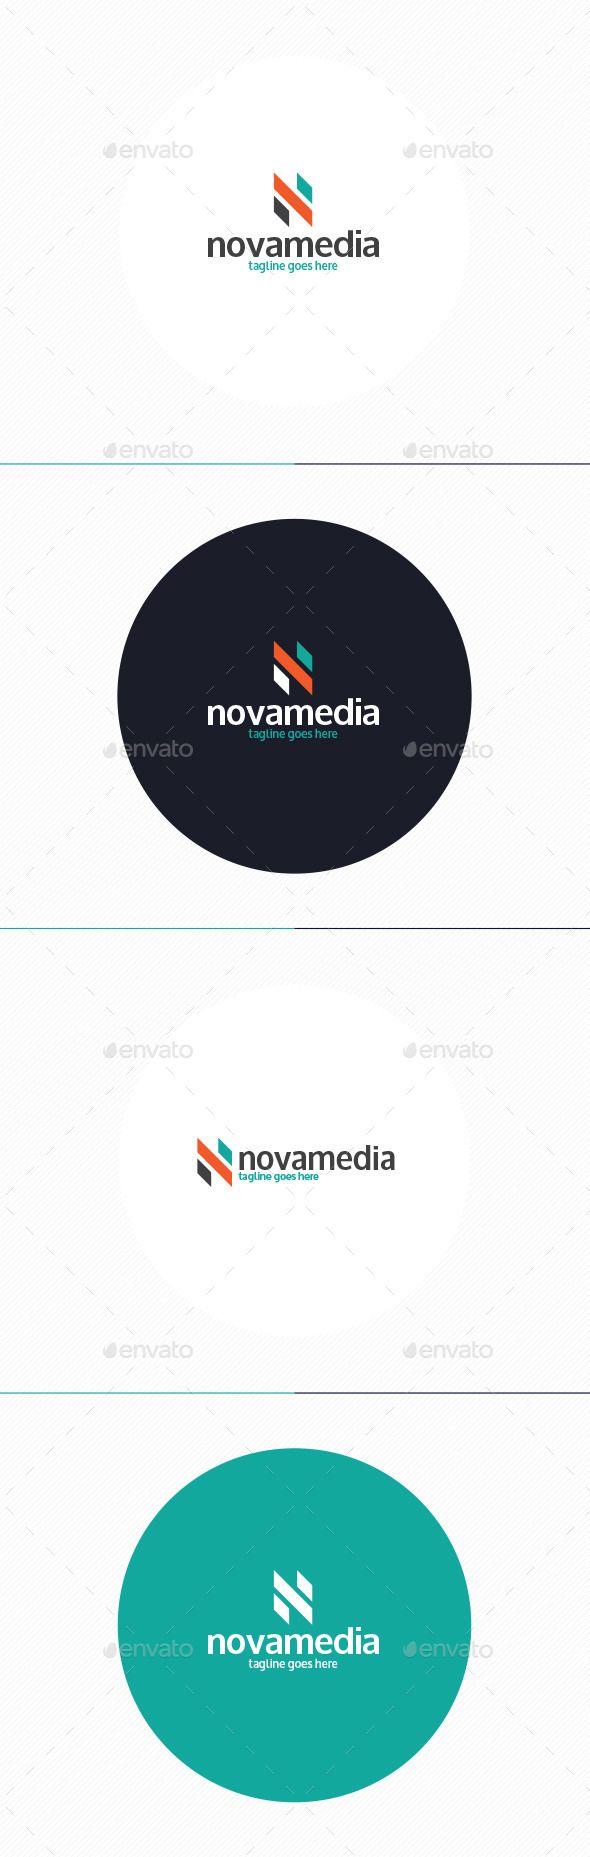 Nova Media Logo u2022 Letter N 60